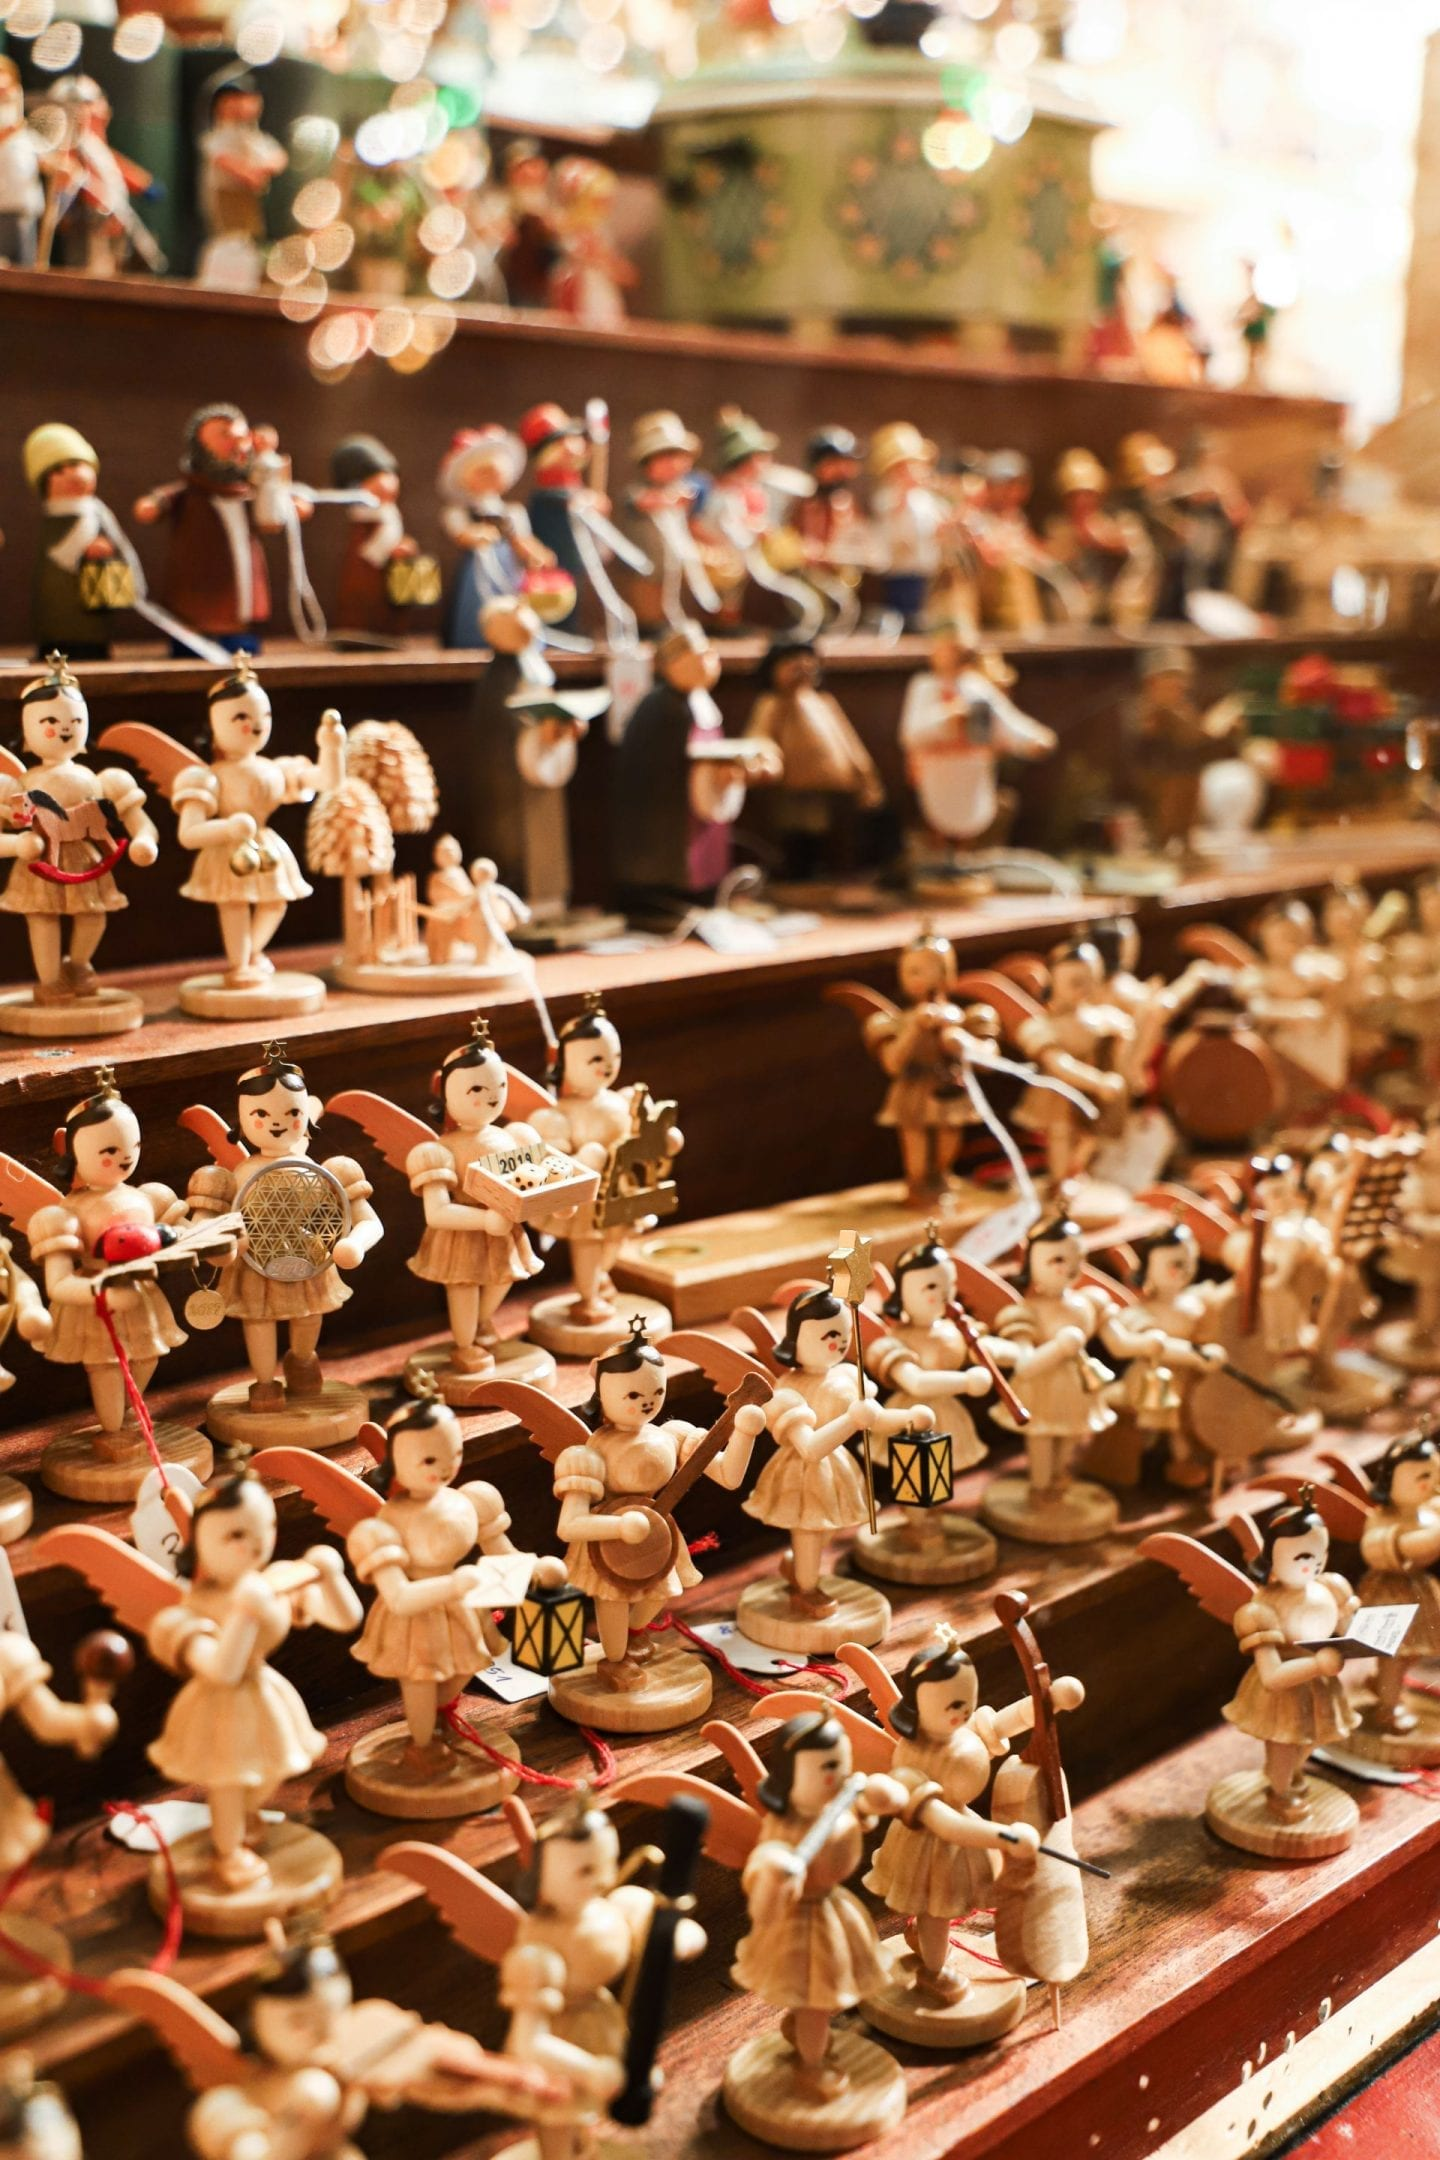 Christmas market crafts